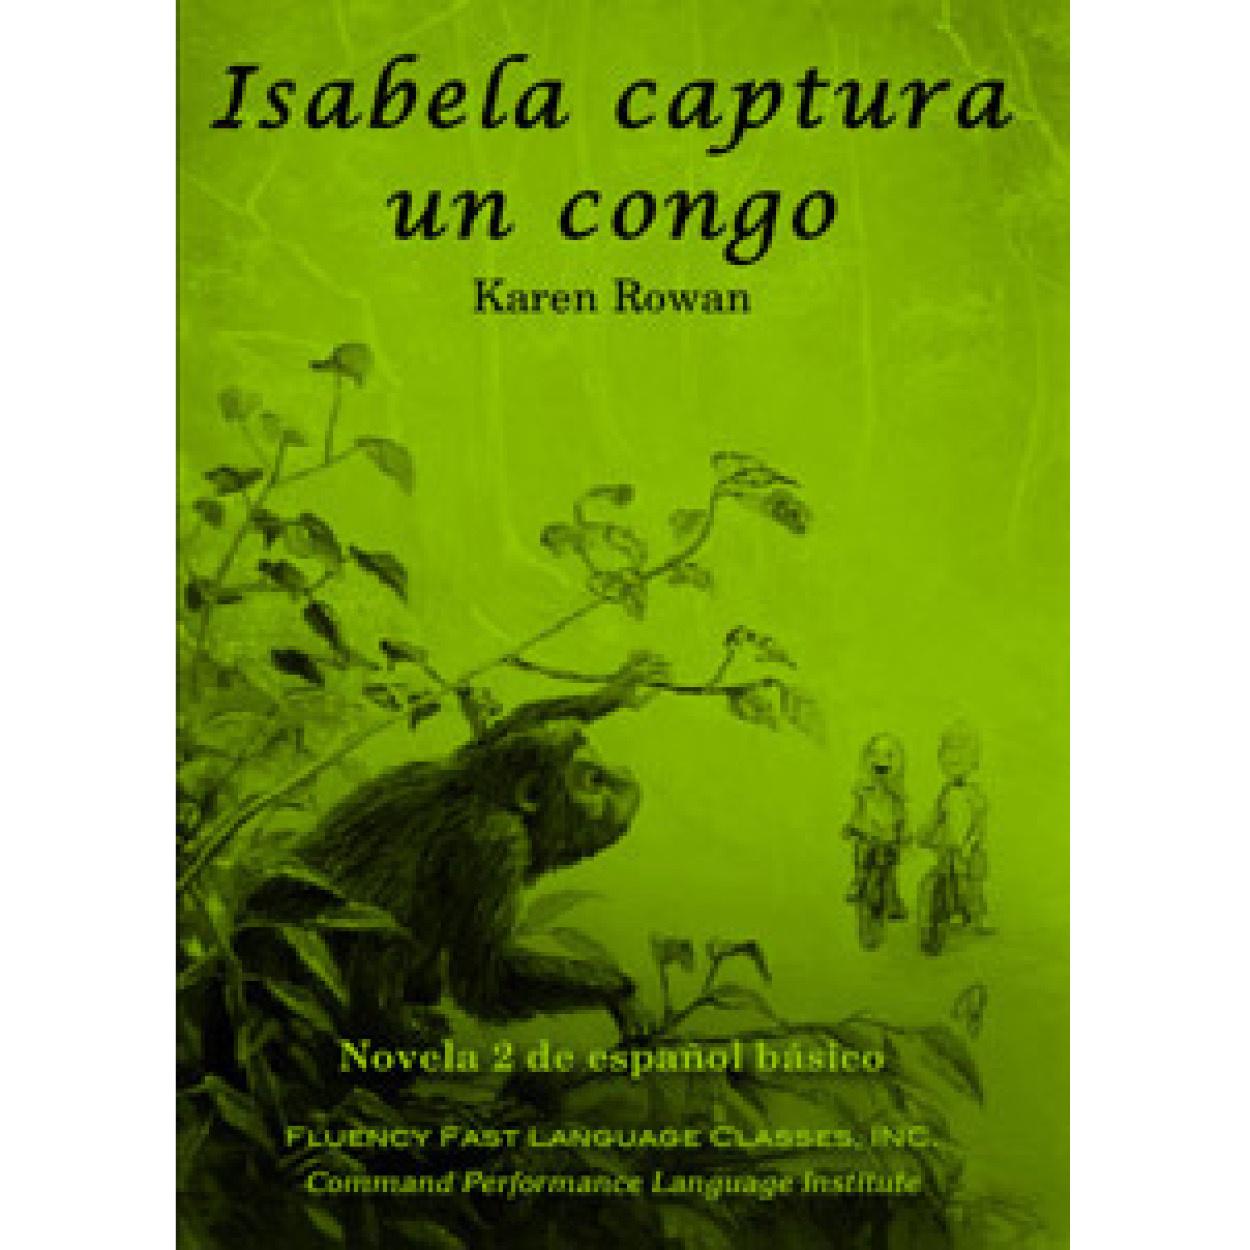 Isabela captura un congo